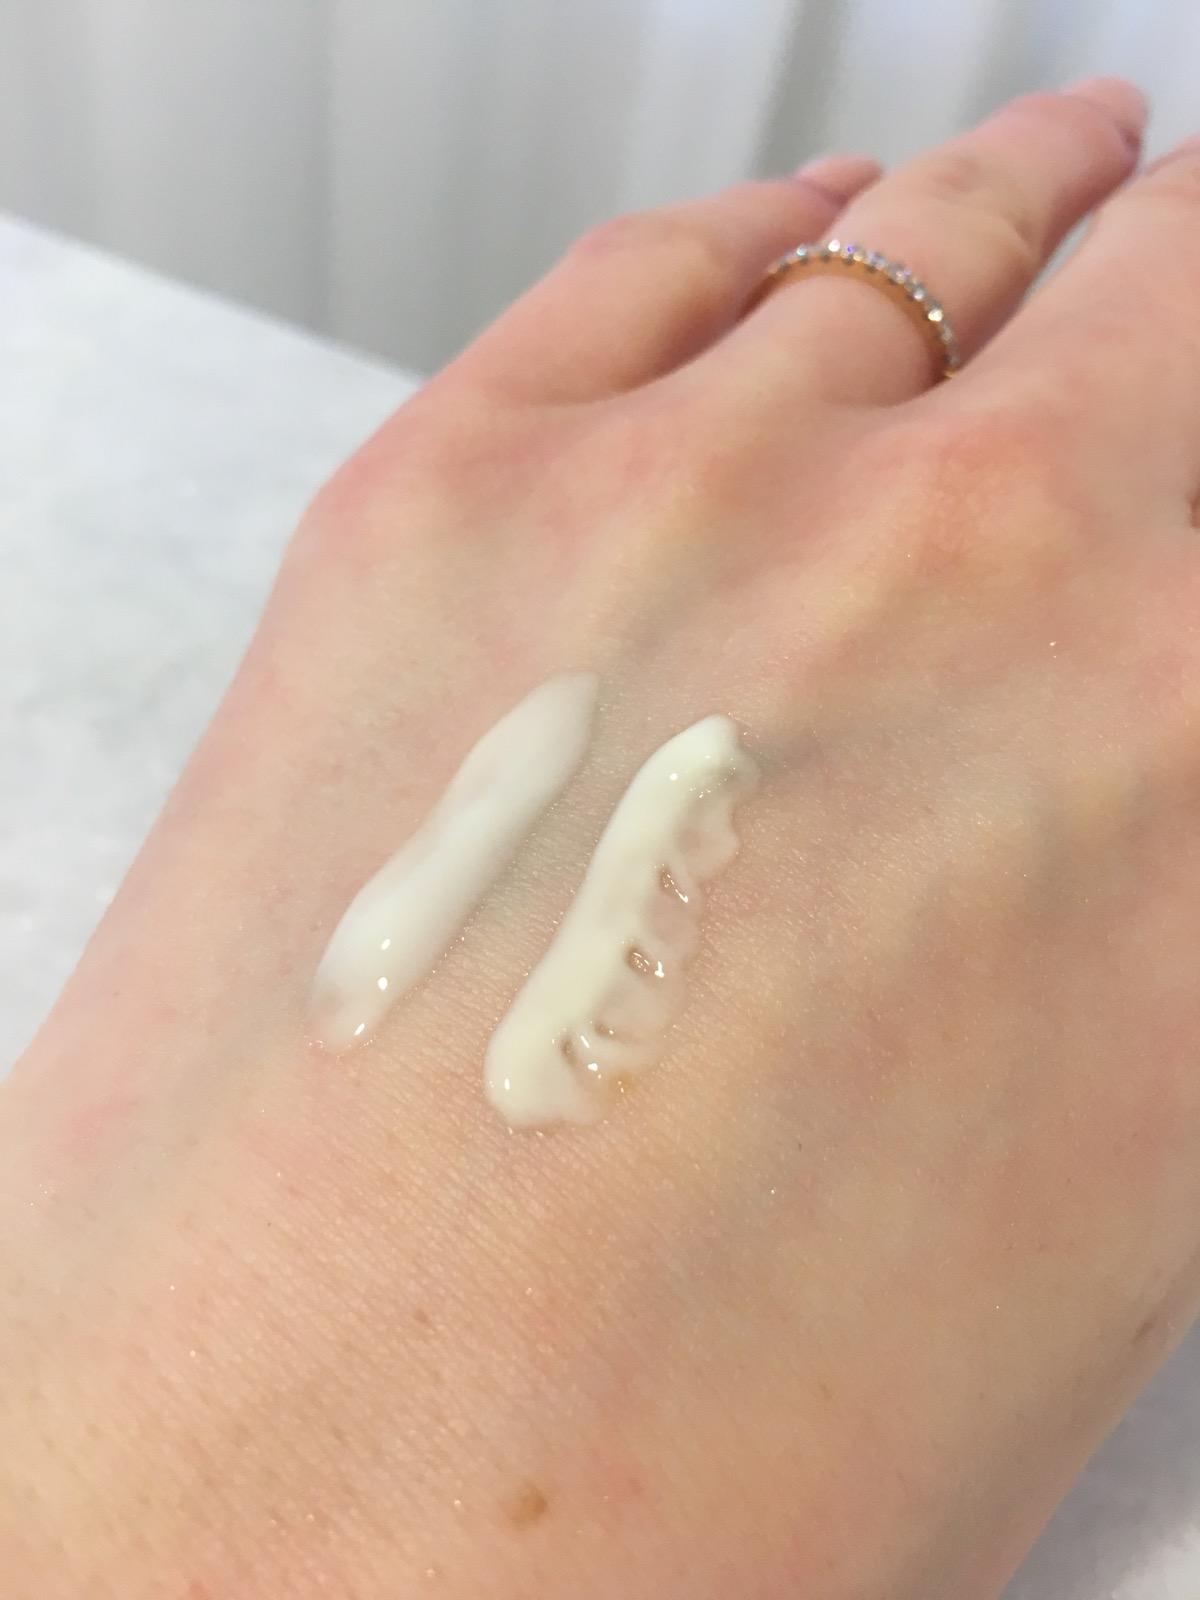 PCA SKIN Skincare skonhetssnack.se IMG_1488